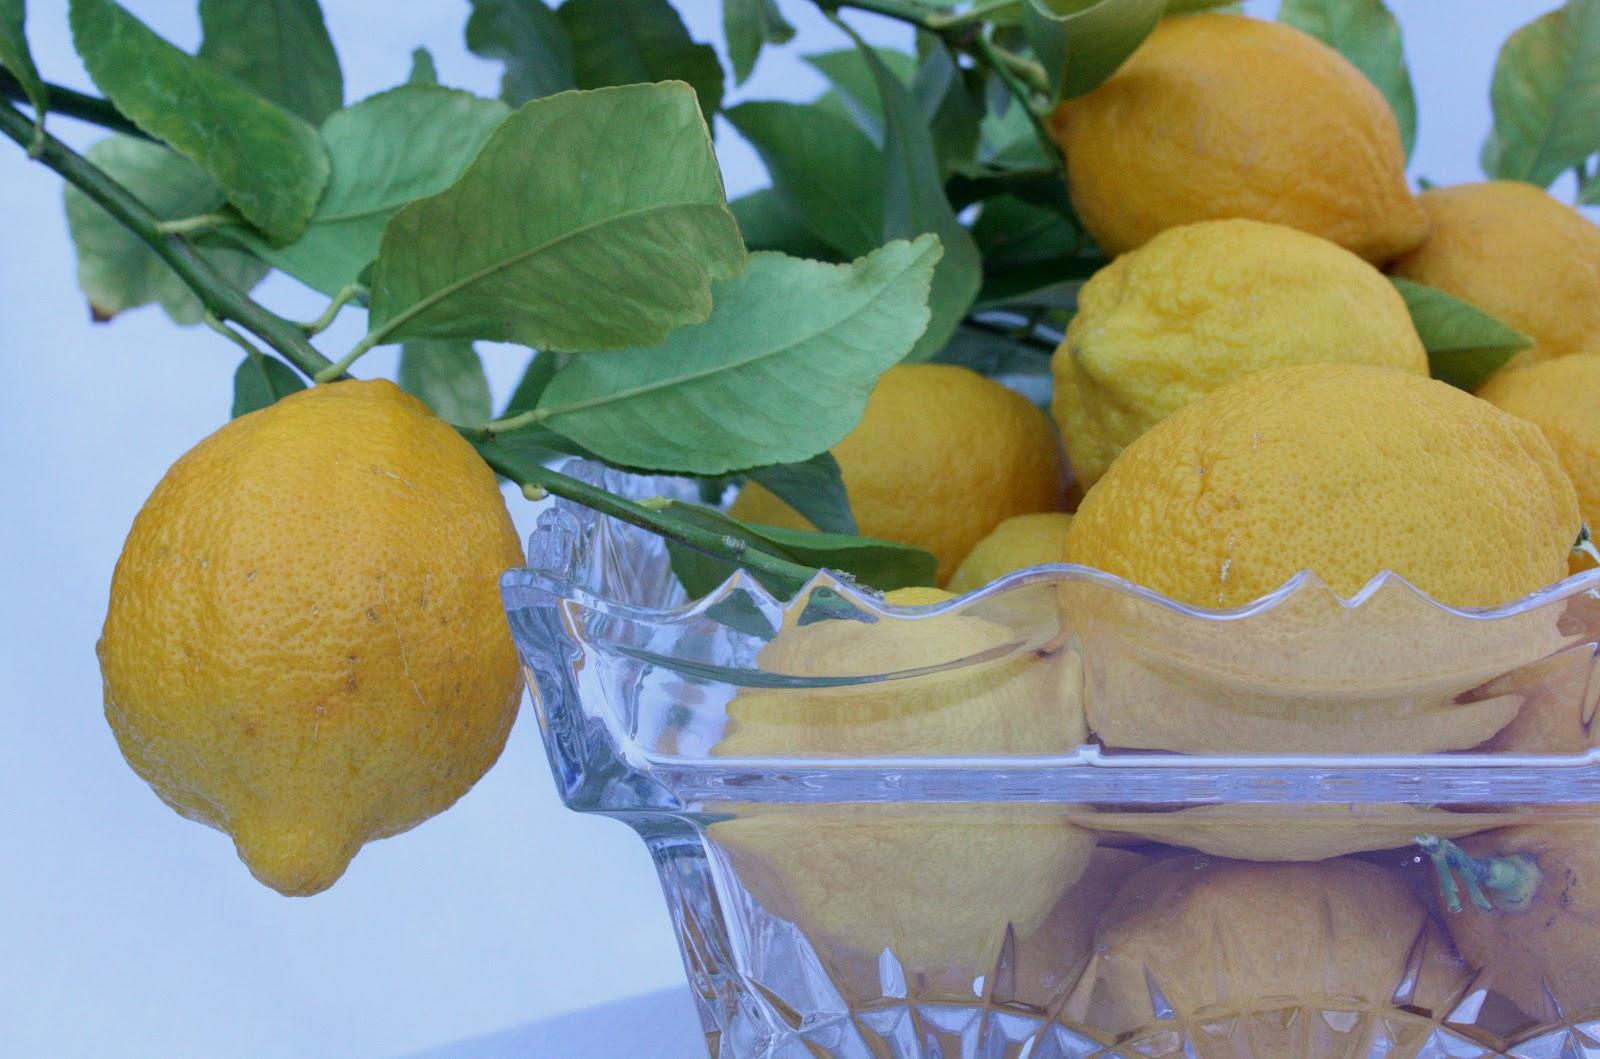 Health Benefits of Lemon {Health & Fitness} - Wendys Hat